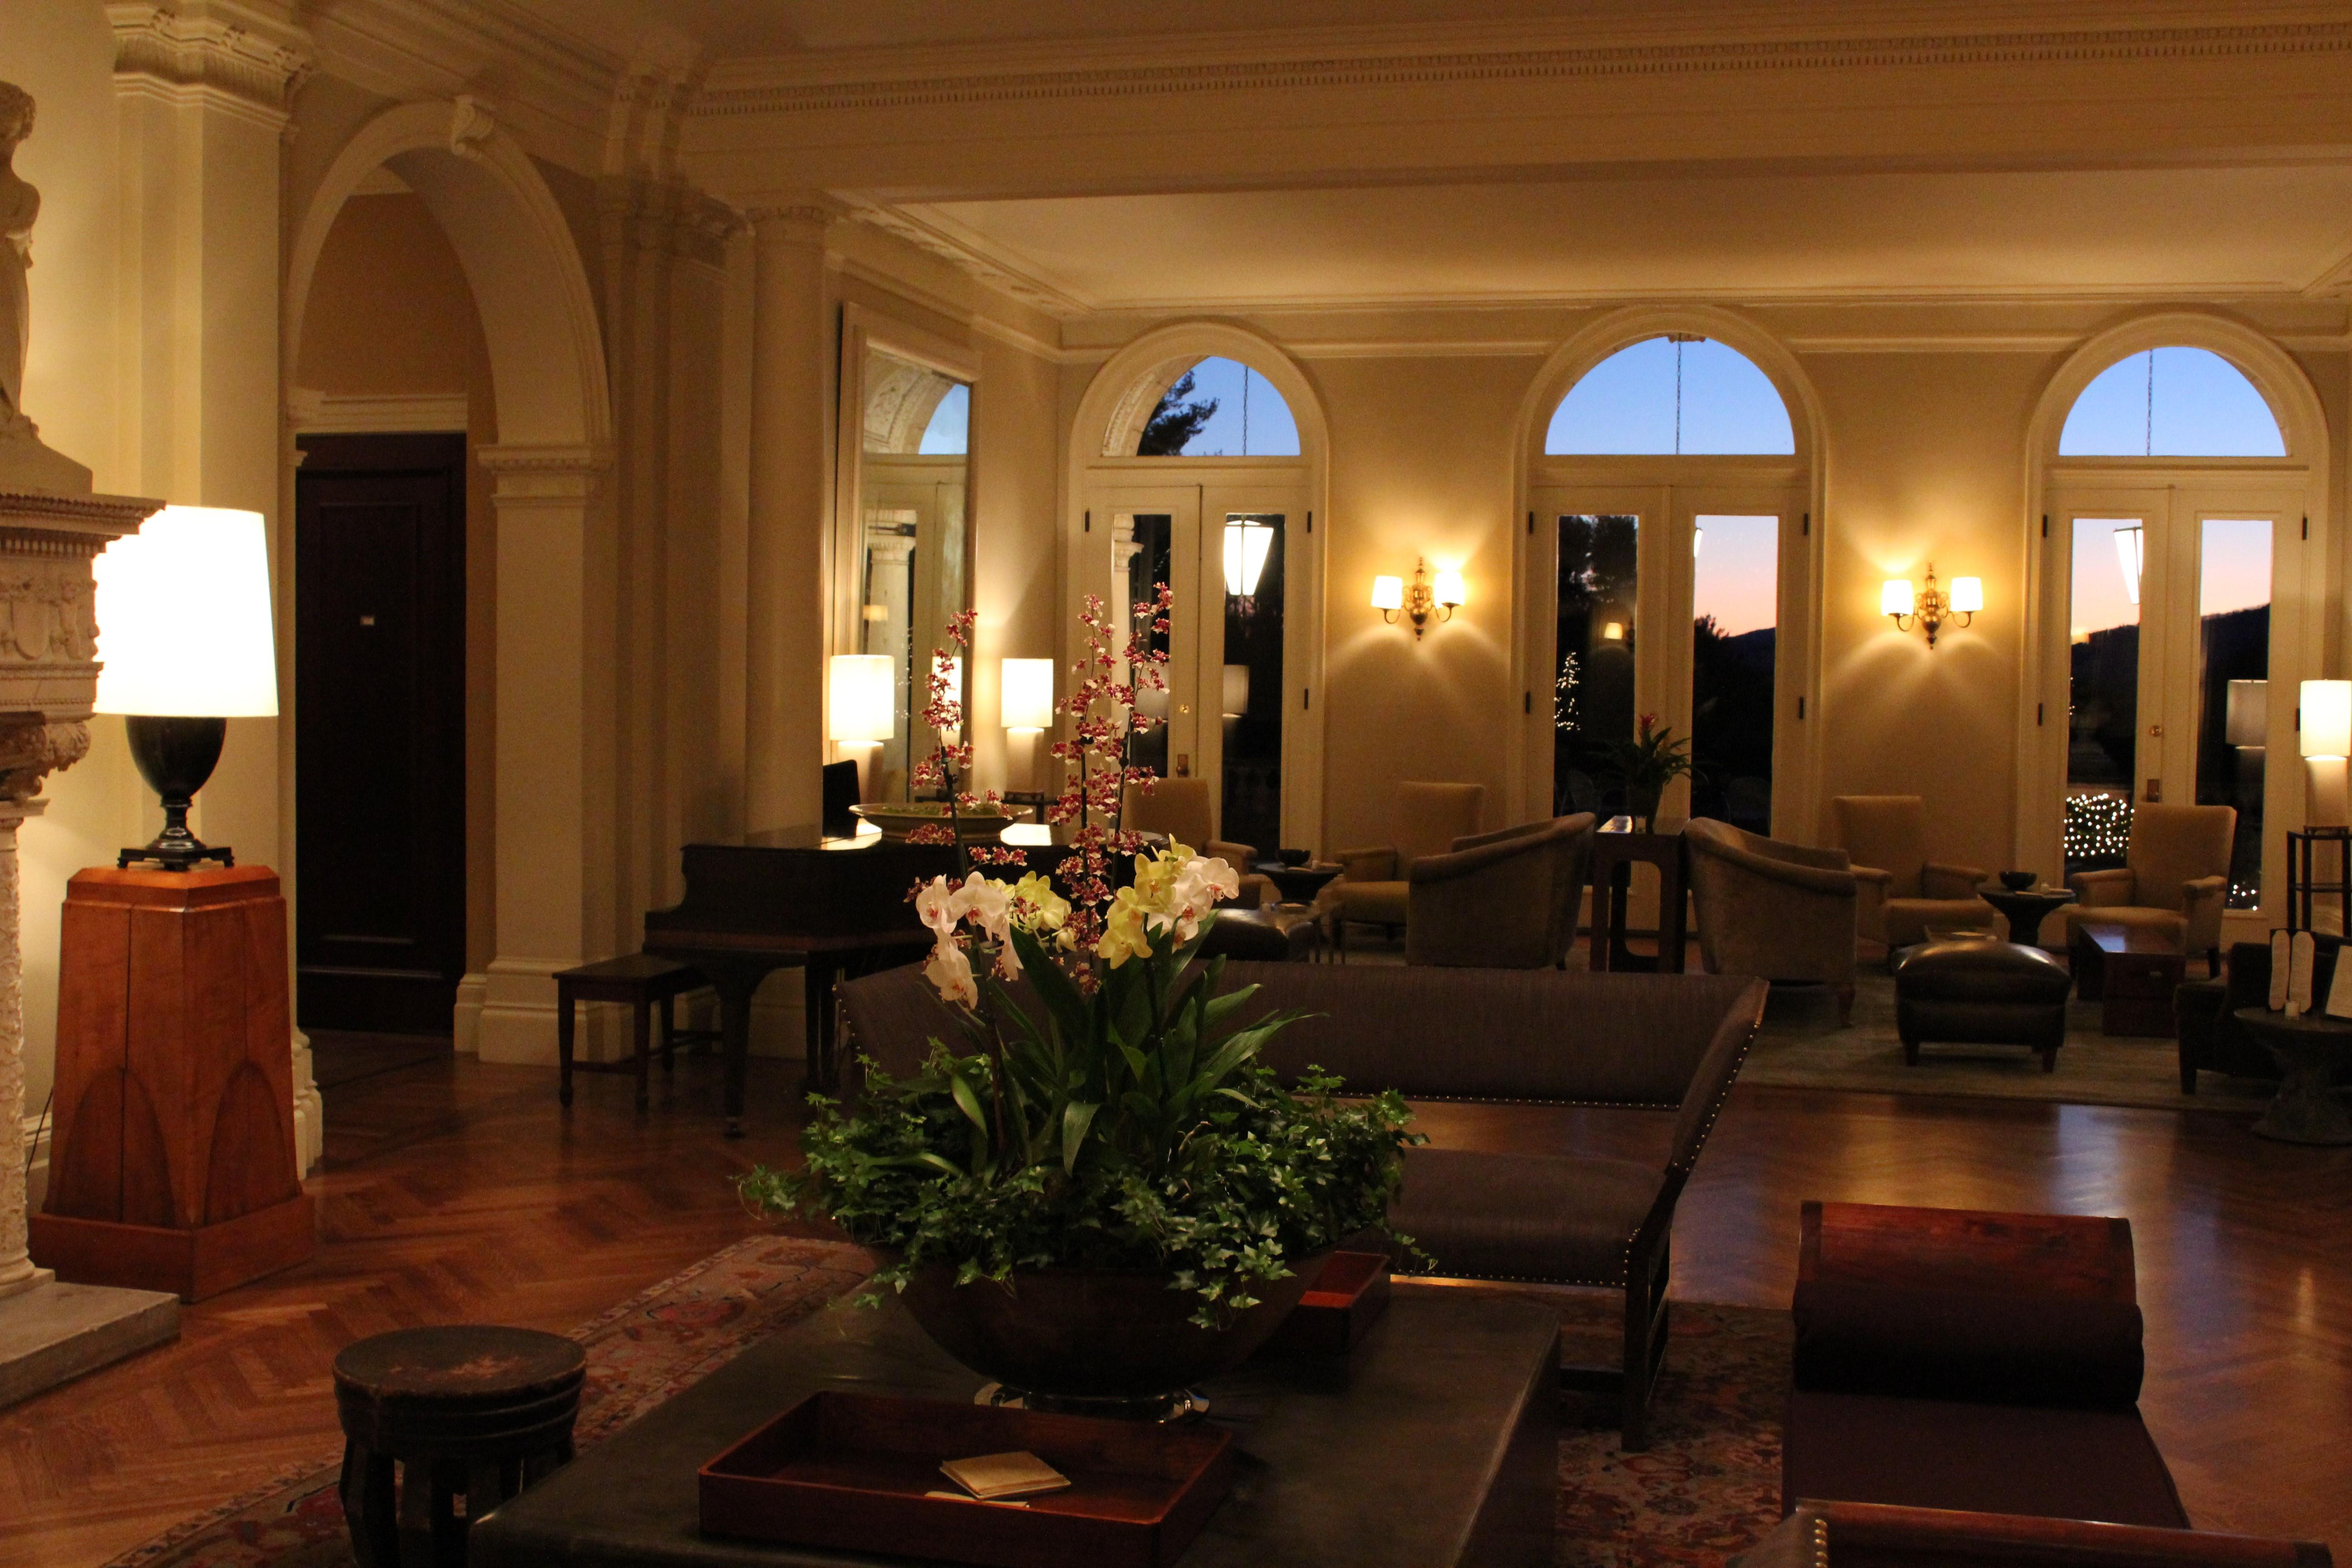 Hotel-Lobby-Design